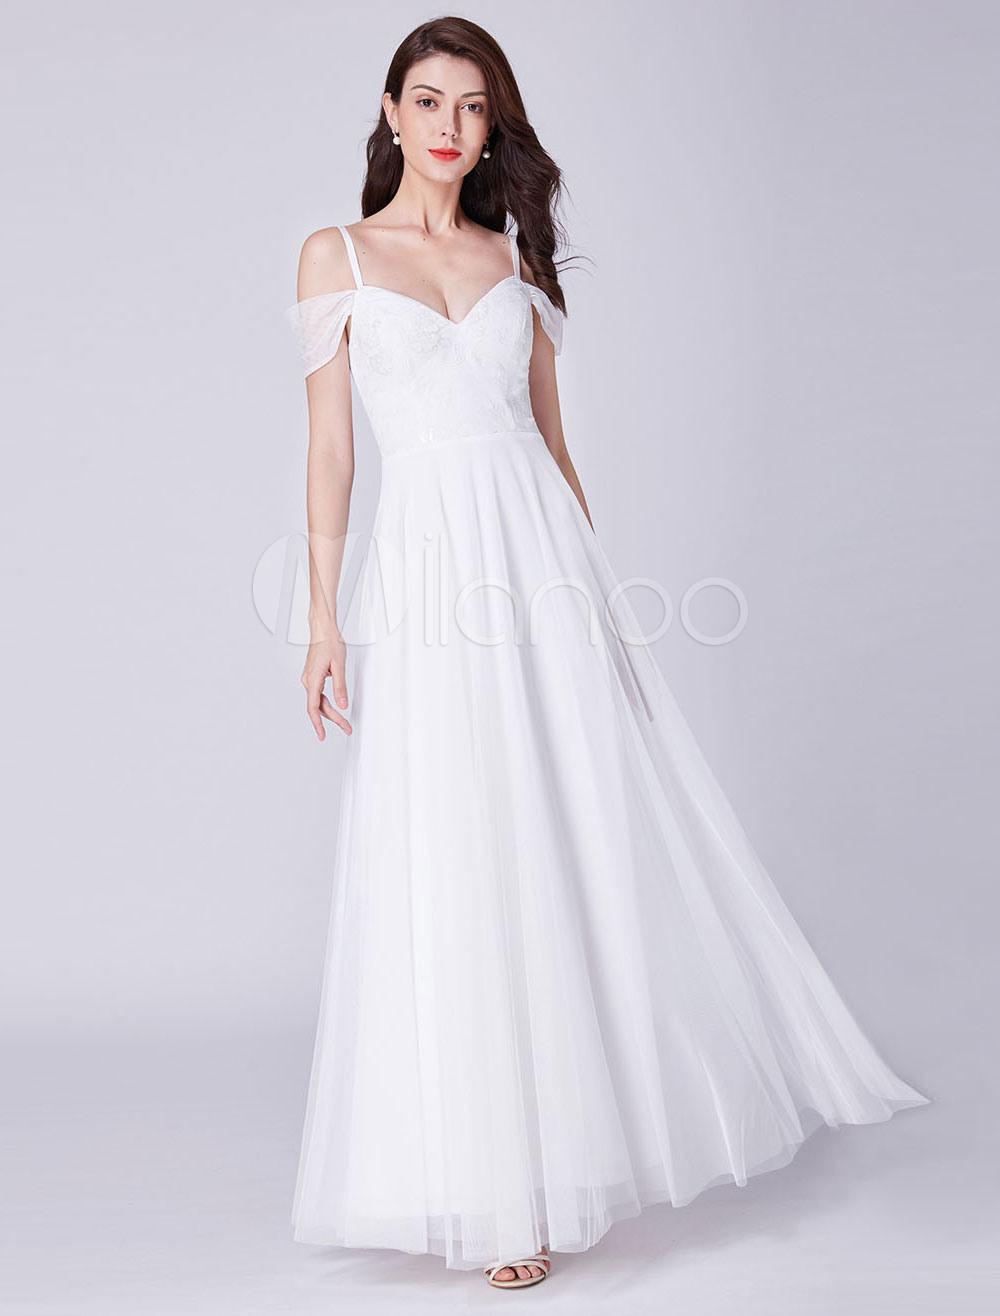 Designer Luxurius Ballkleid Weiß Lang Vertrieb  Abendkleid